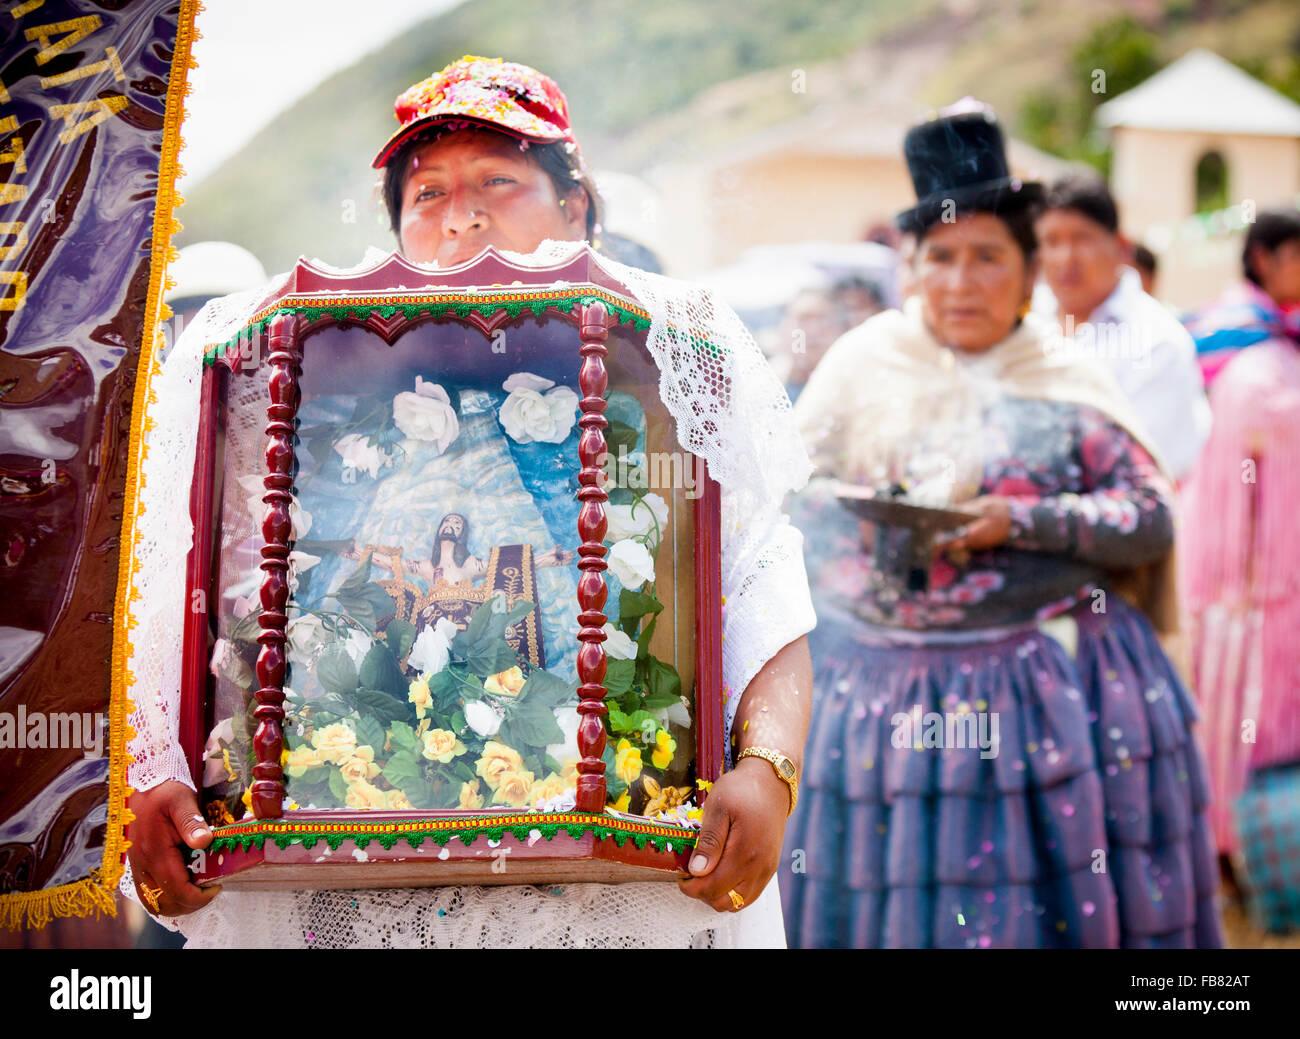 Religious parade during a fiesta in San Pedro, La Paz province, Bolivia. - Stock Image